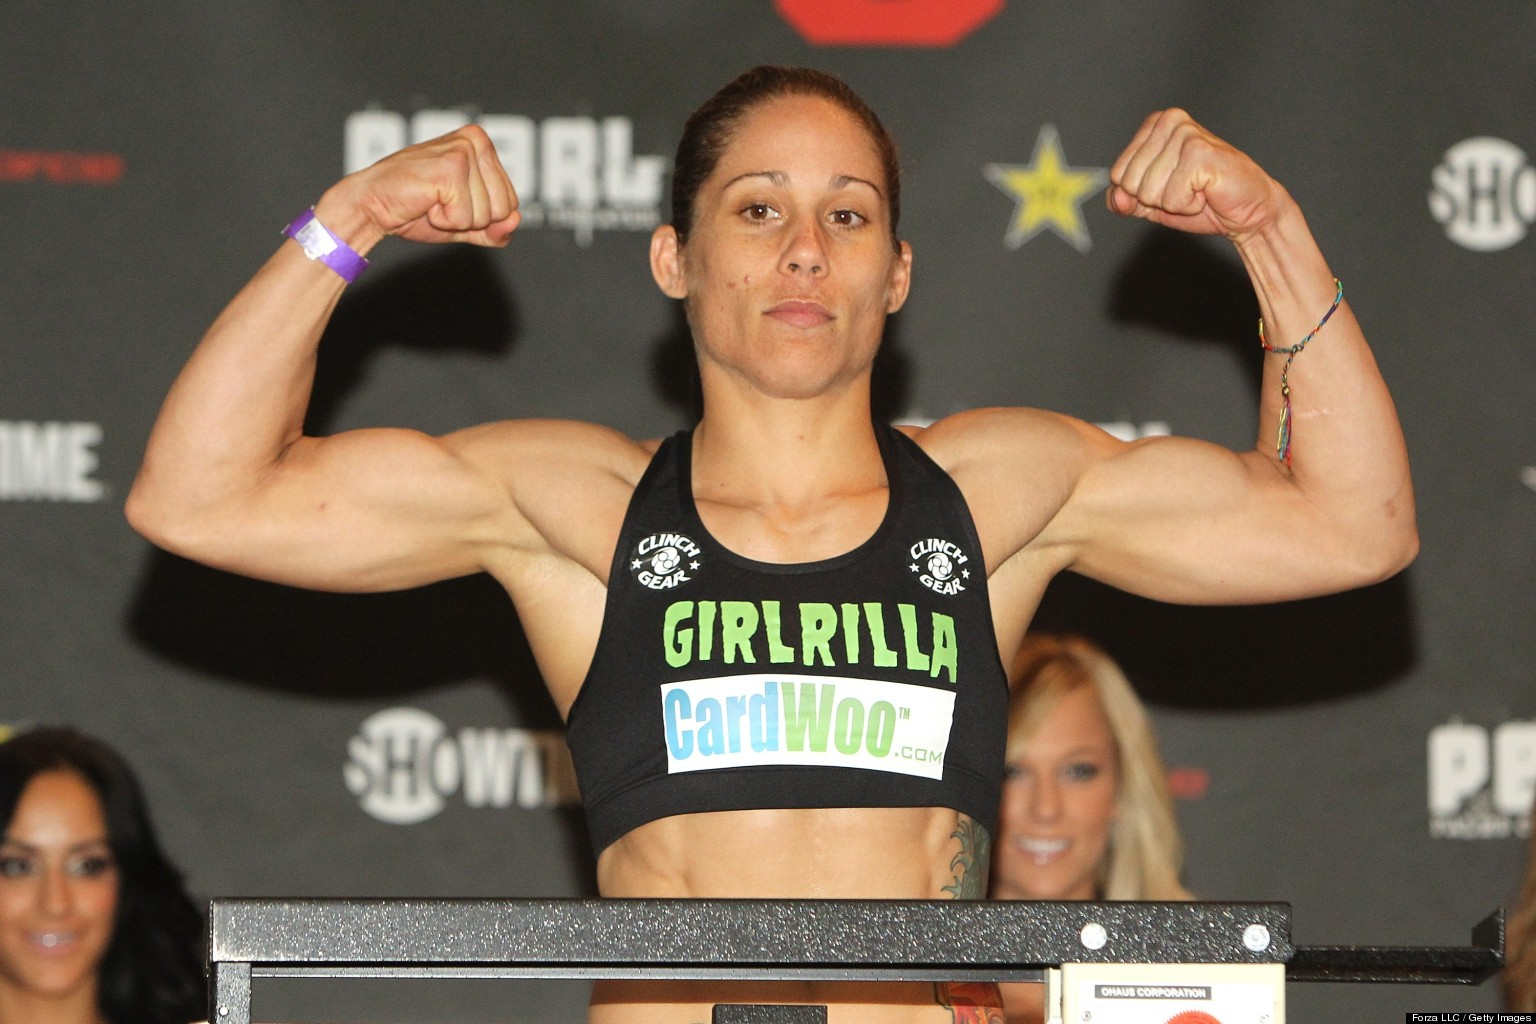 Reporte UFC: Liz Carmouche y Renan Barao son despedidos 1